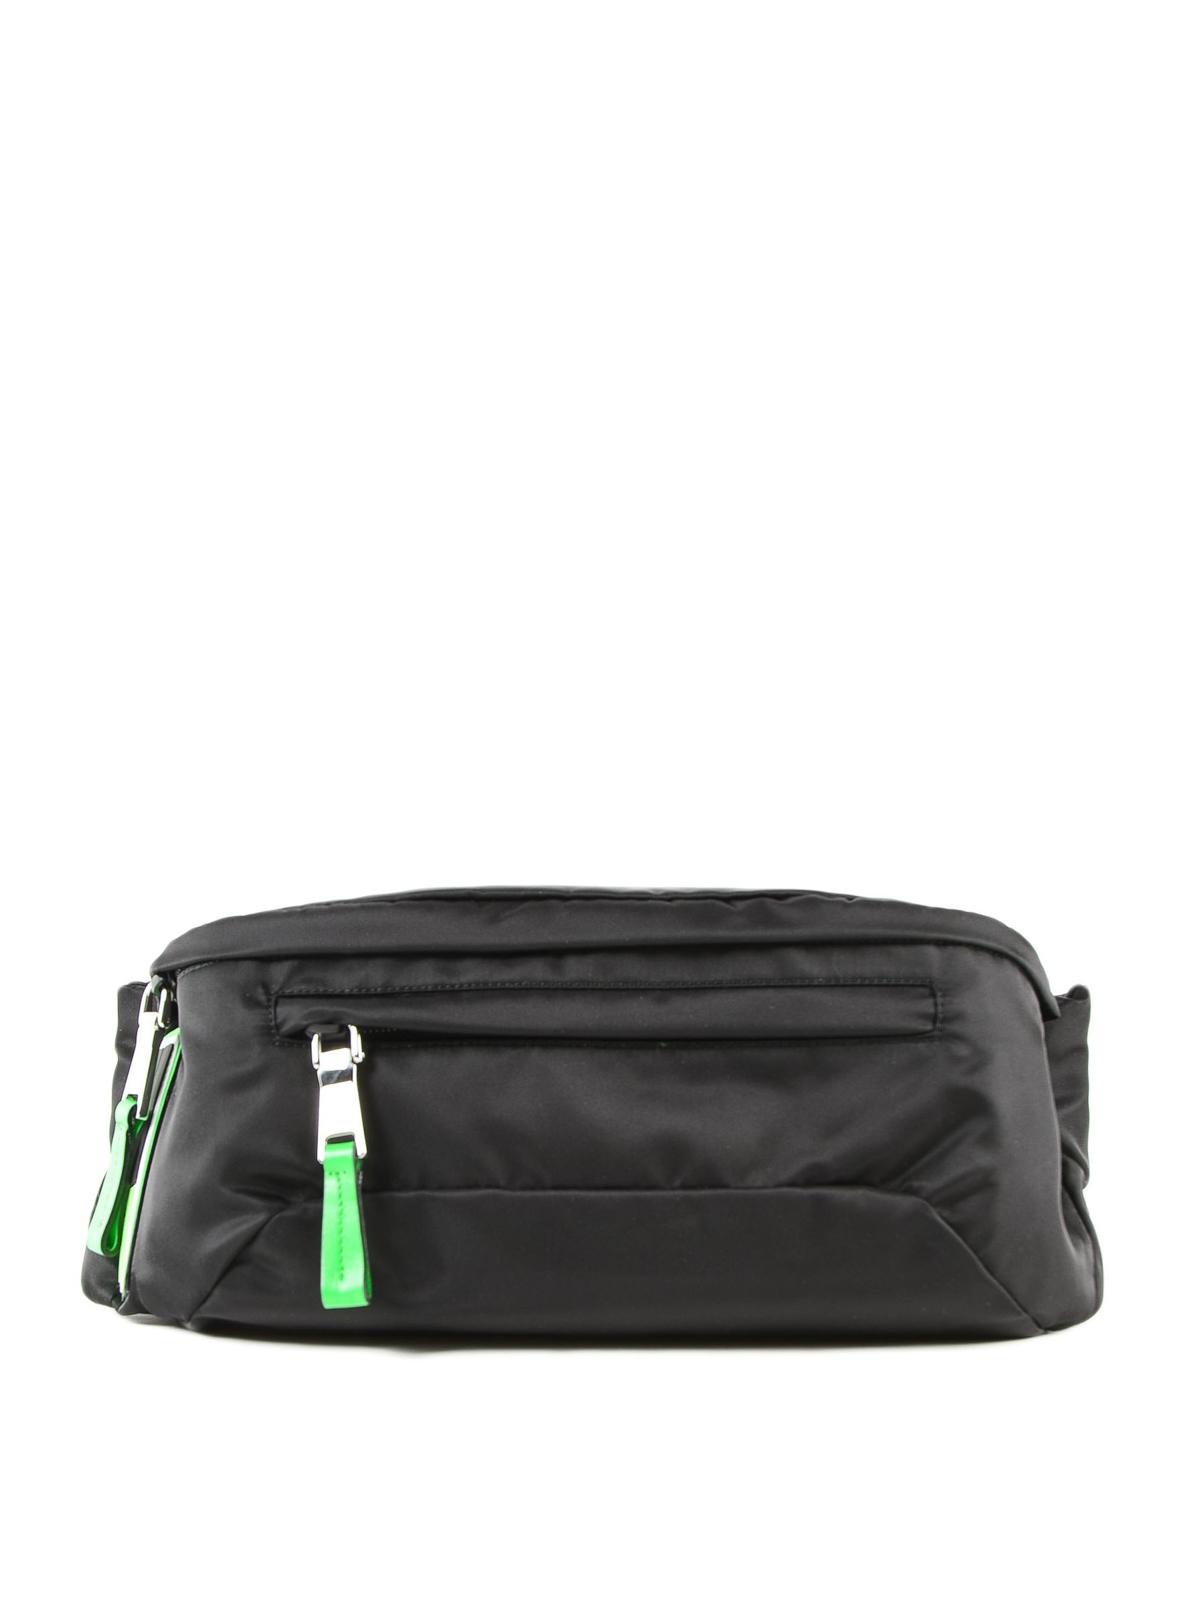 15a9c8c5222c Prada - Black tech fabric belt bag - belt bags - 2VL0082BTE XVS